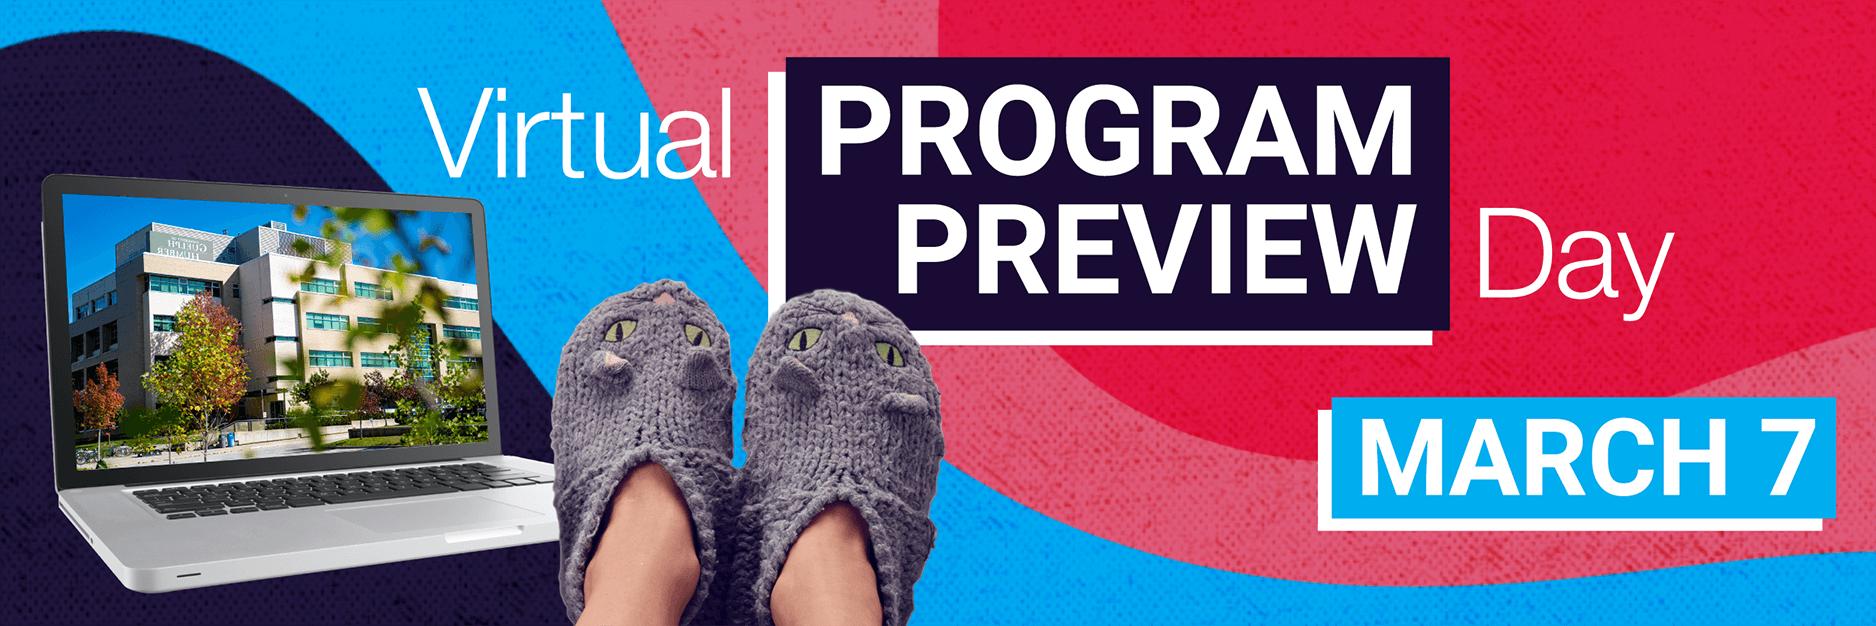 Virtual Program Preview Day: March 7